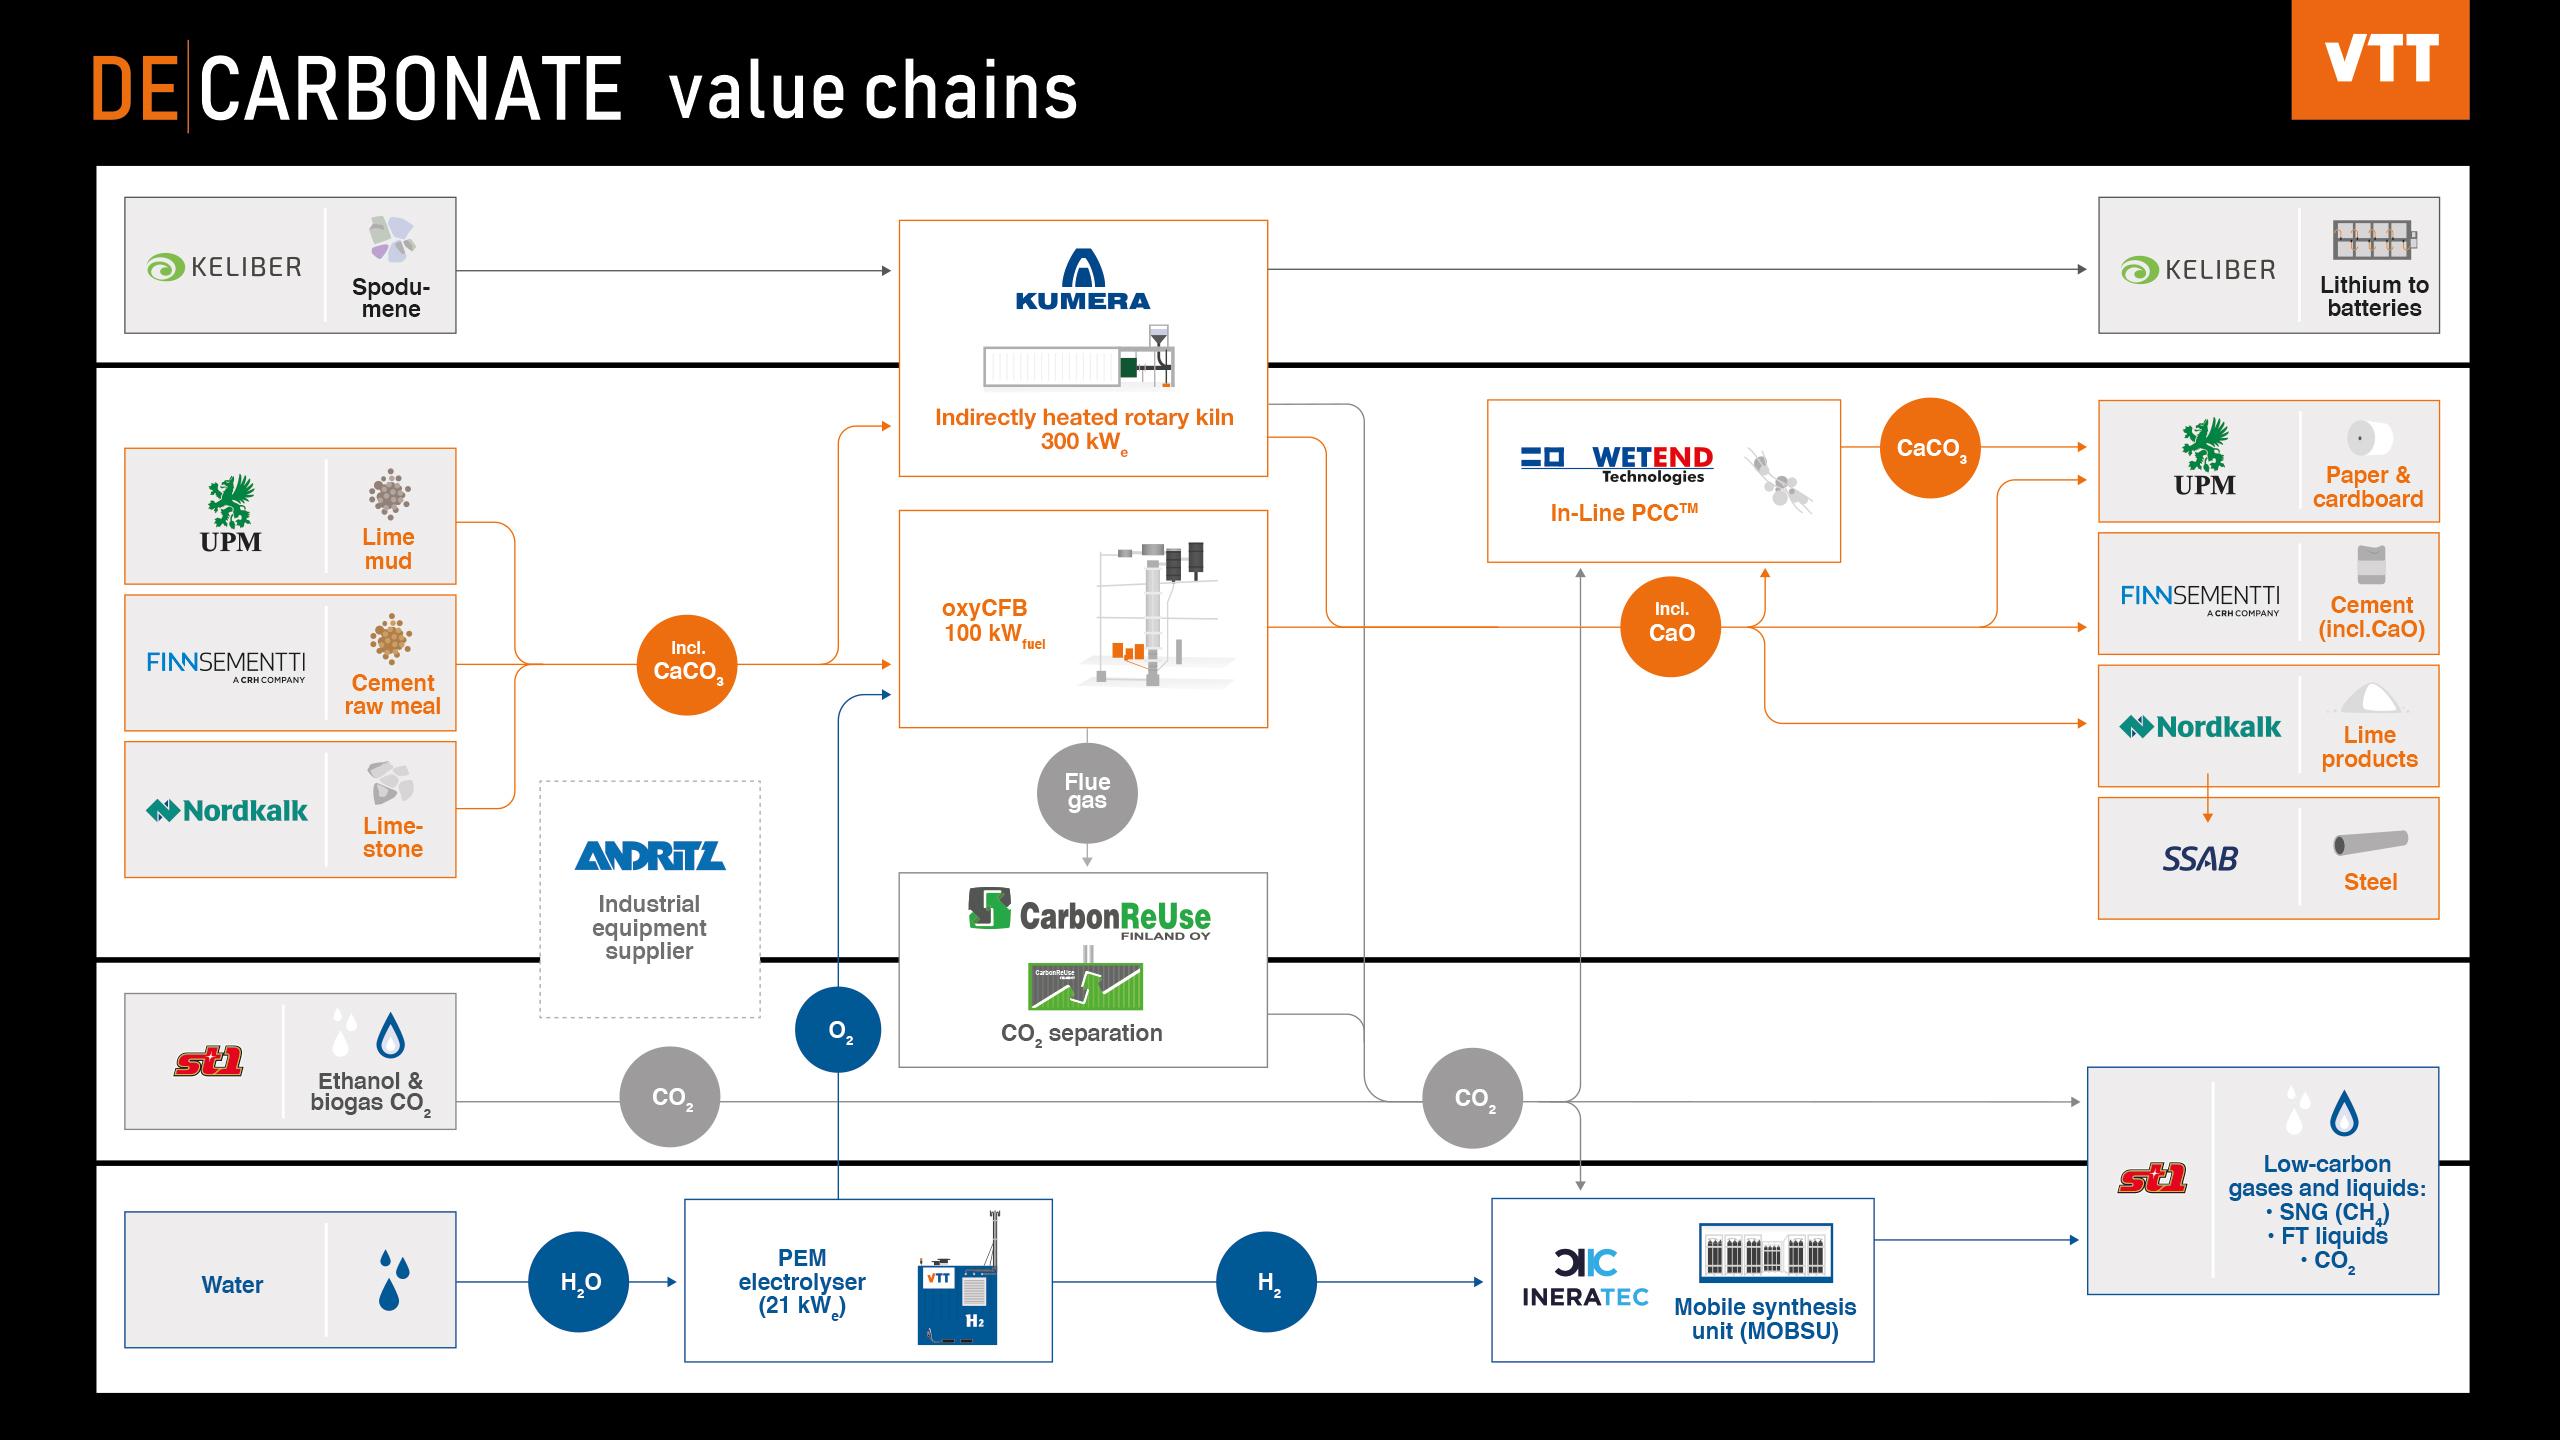 Decarbonate value chains